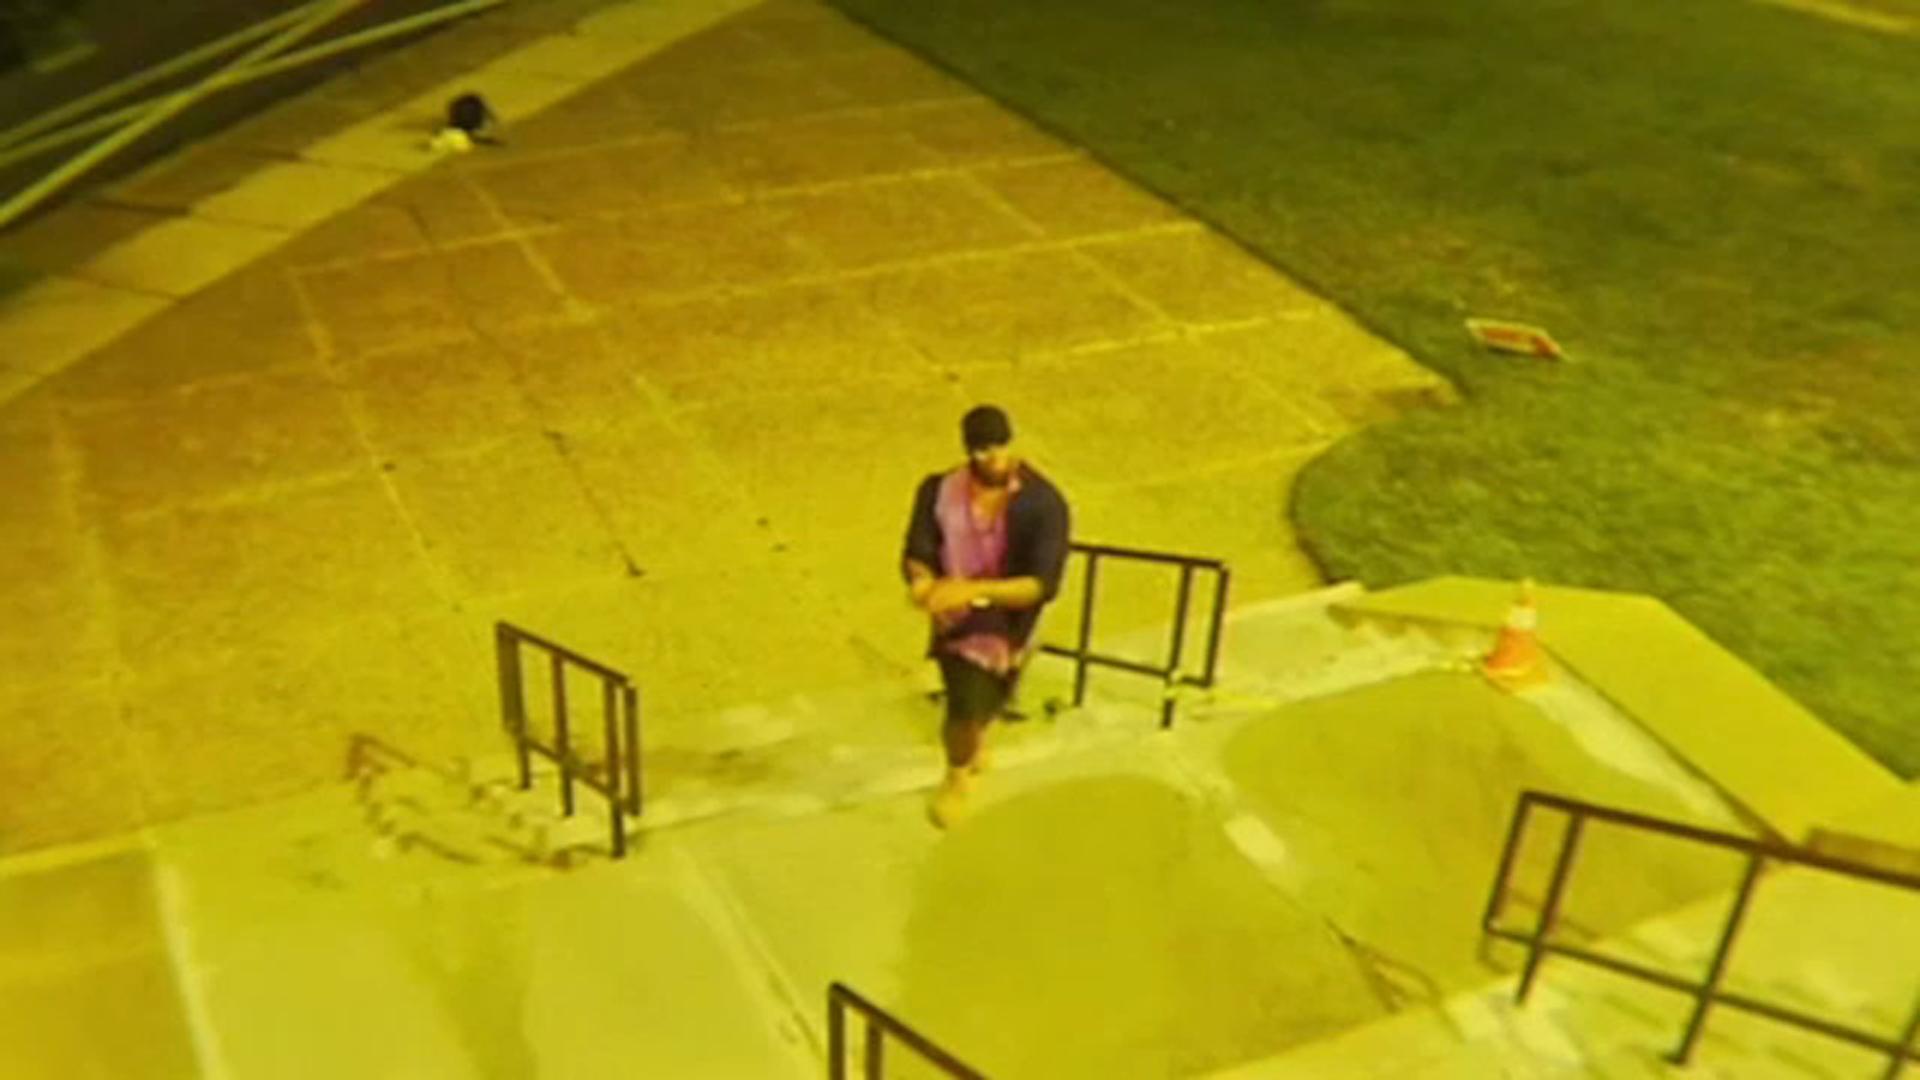 Suspected Vandal Caught On Camera Throwing Rocks At West Oak